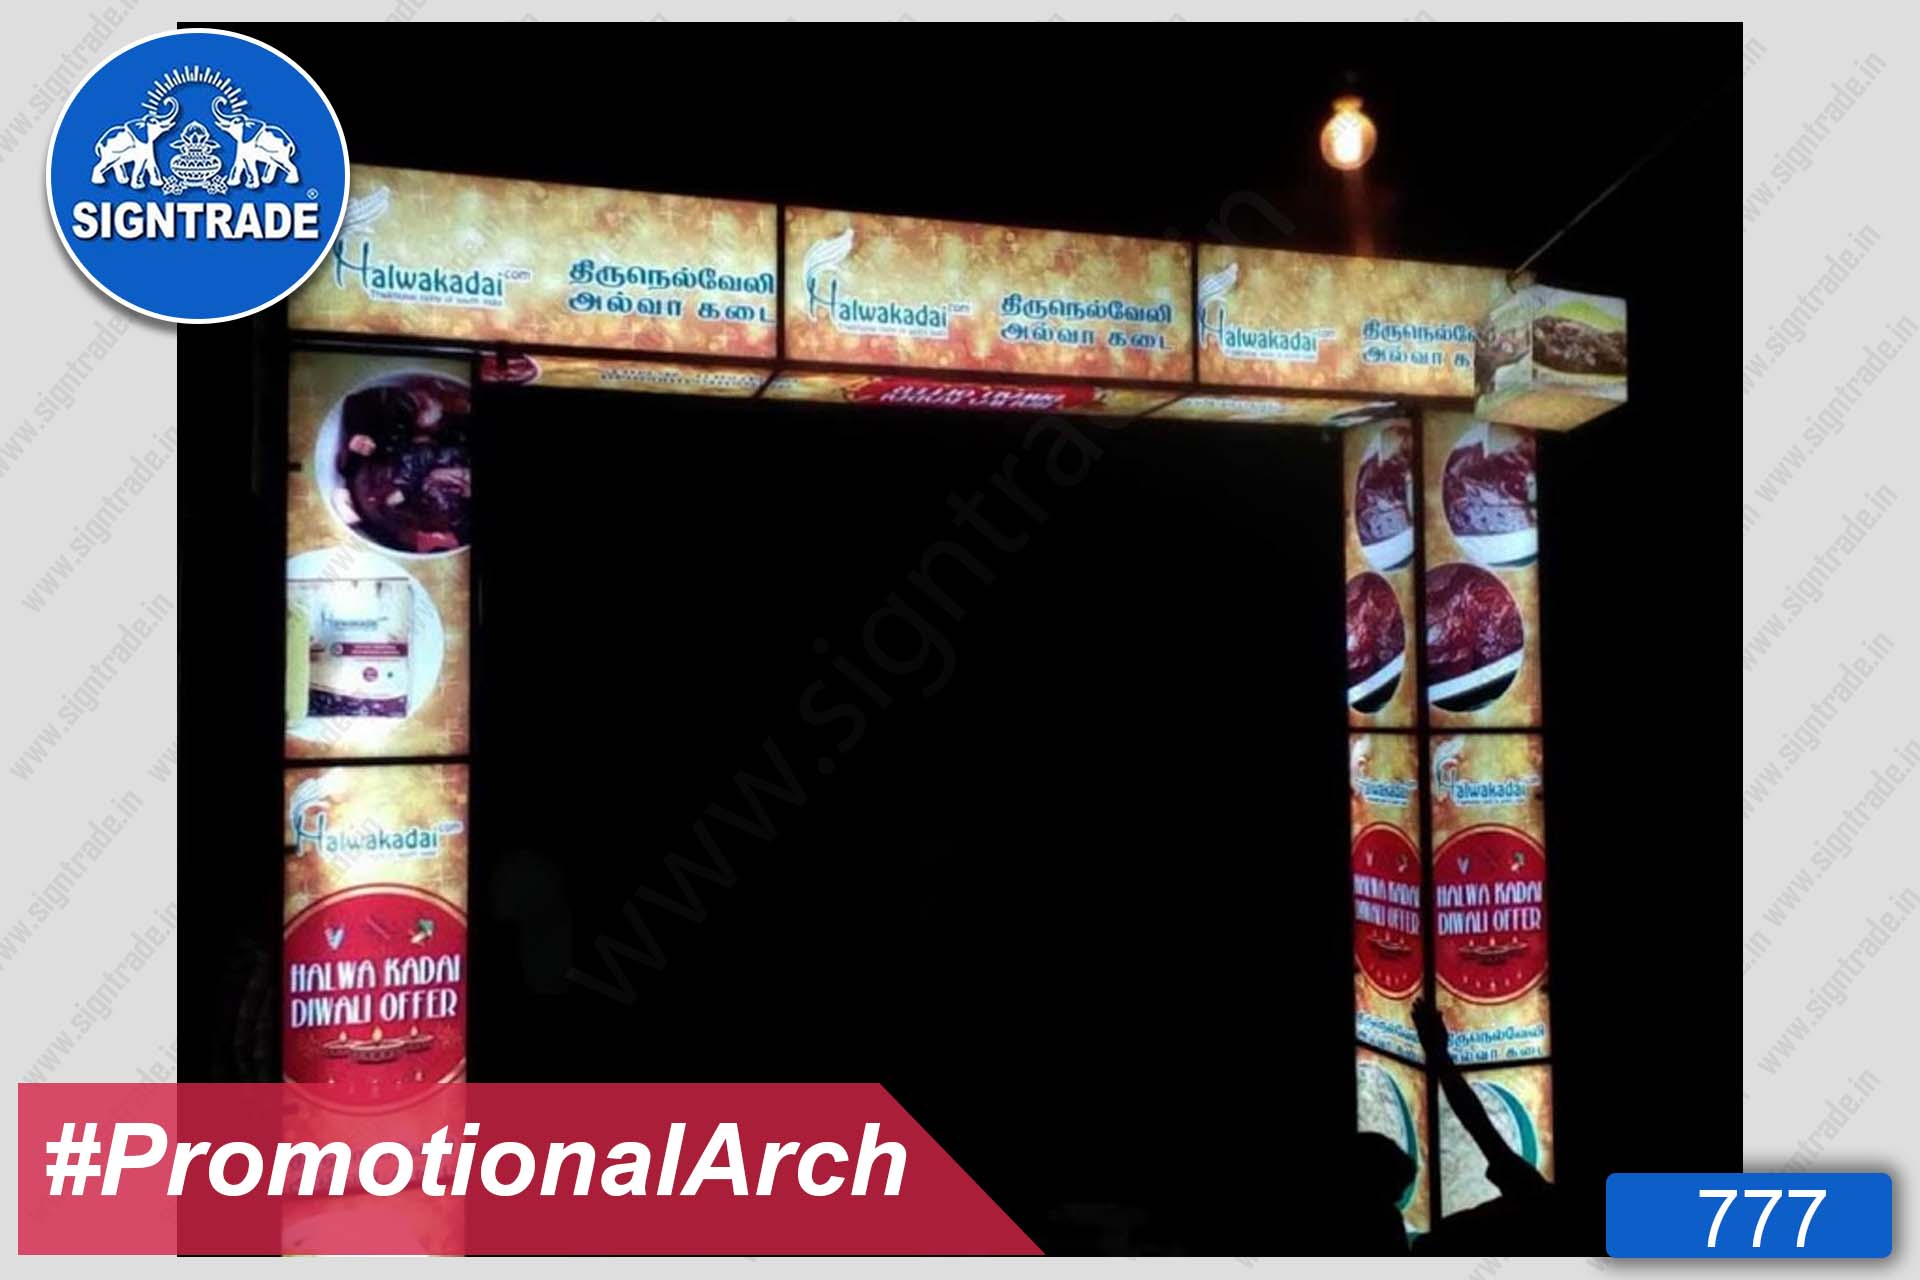 Tirunelveli Halwa Kadai - Promotional Arch